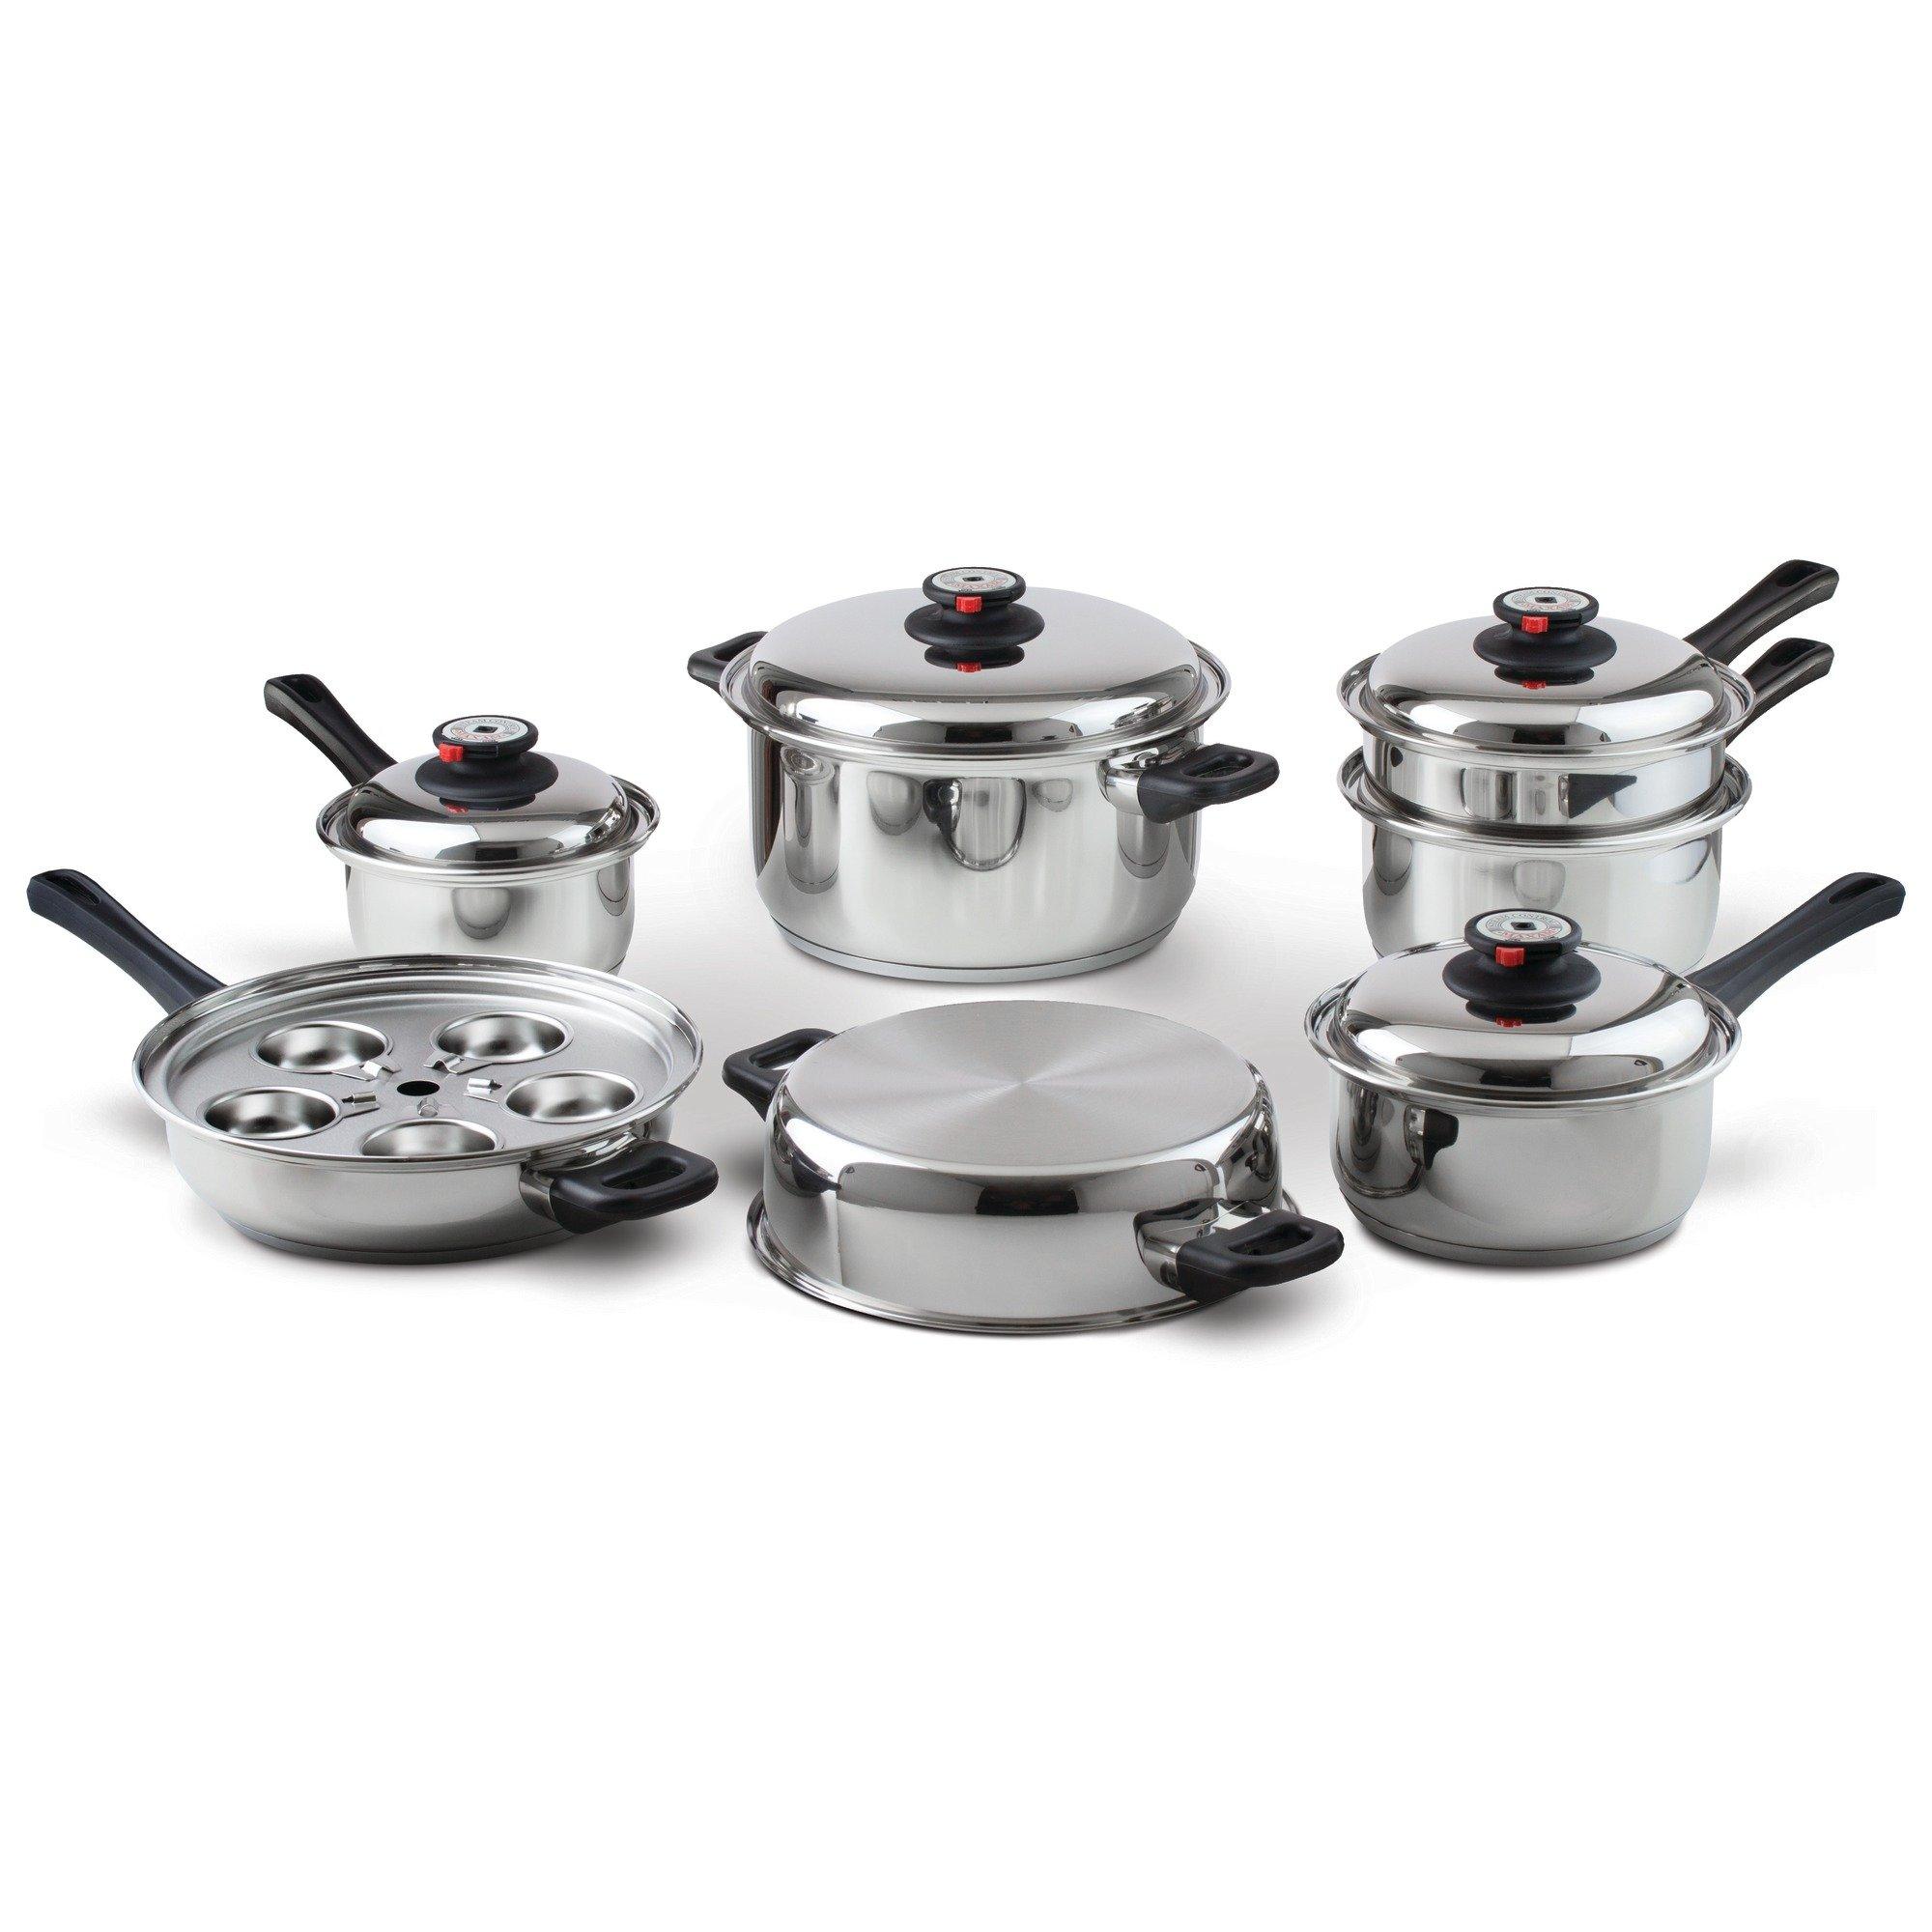 Maxam KT17 17-Piece 9-Element Surgical-Stainless-Steel Waterless Cookware Set by Maxam